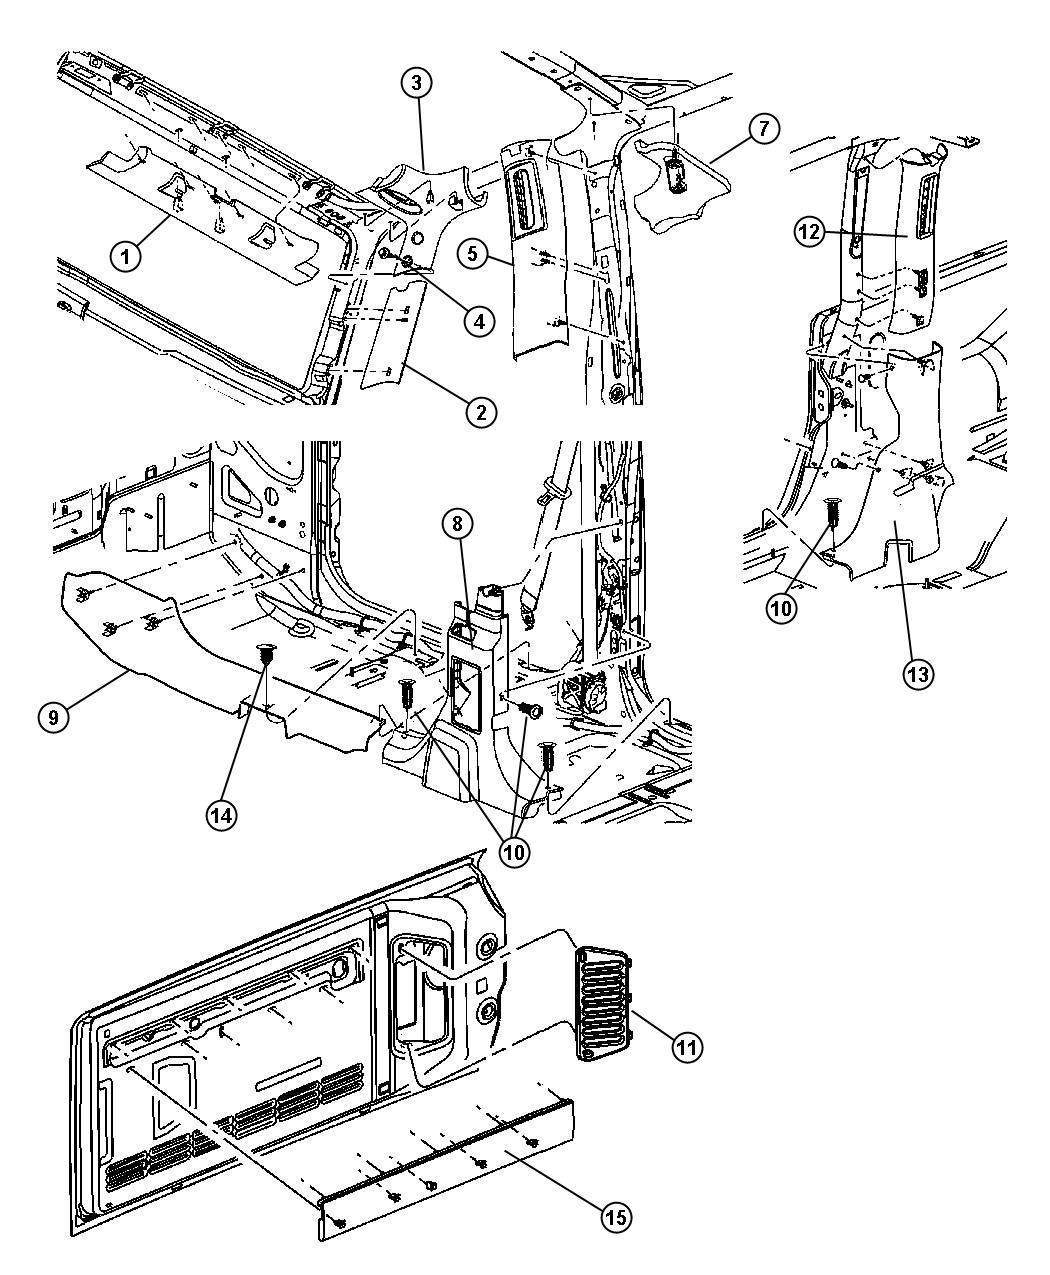 1986 jeep comanche wiring diagram set nos